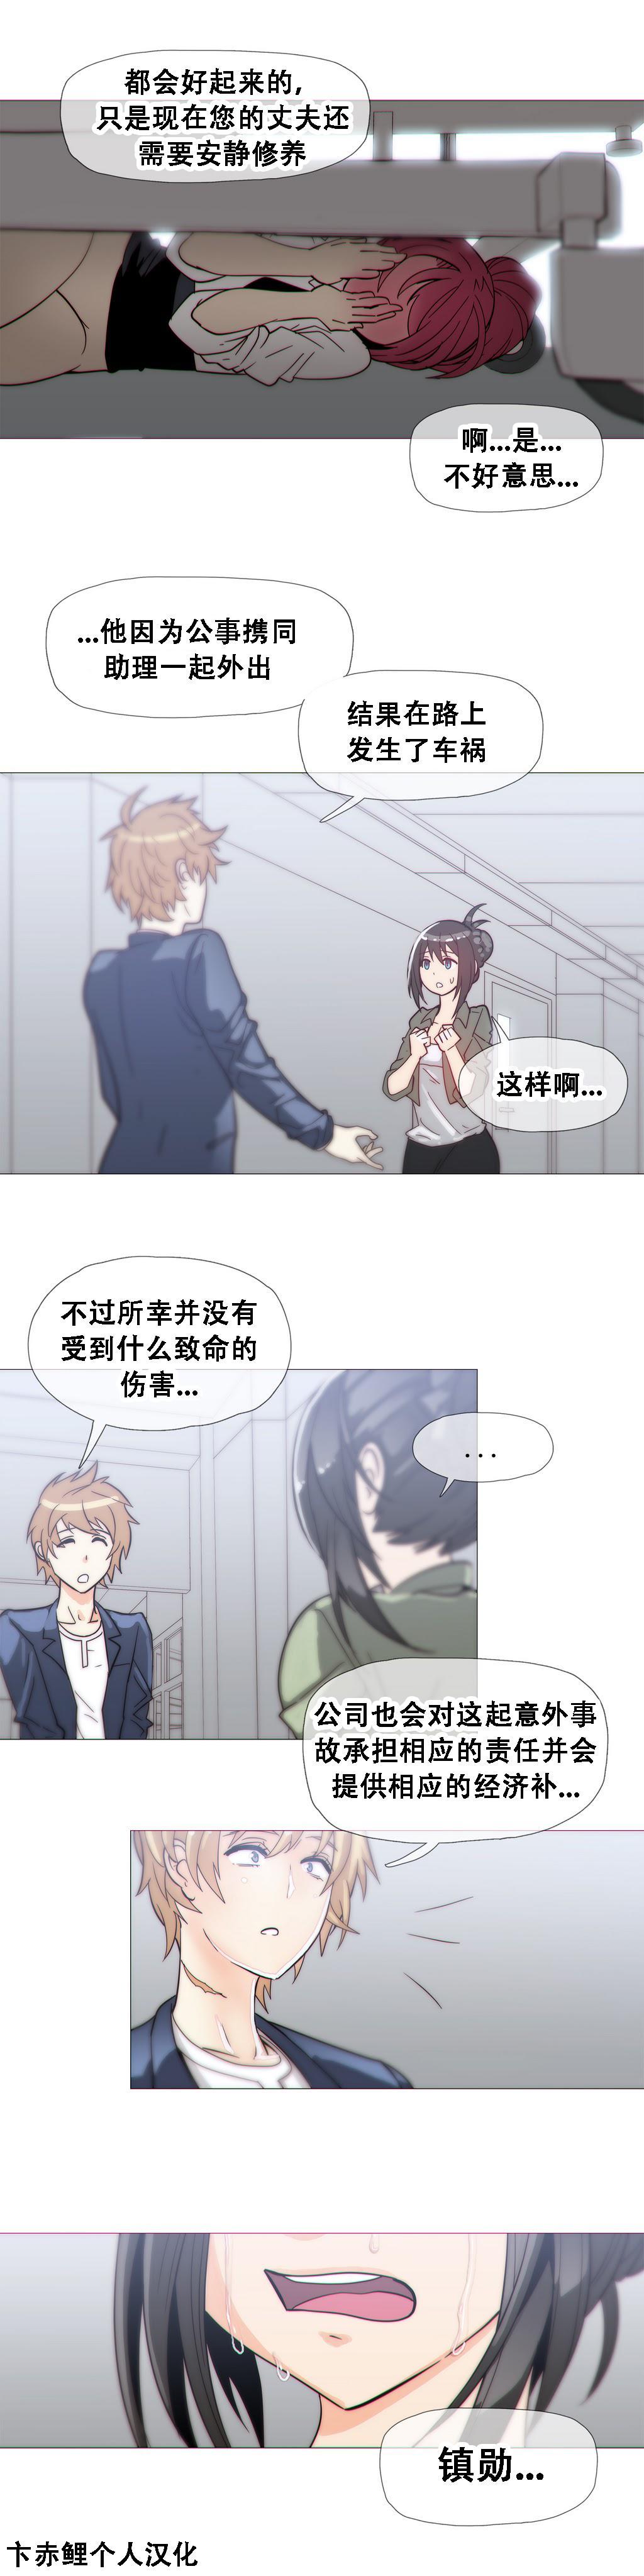 HouseHold Affairs 【卞赤鲤个人汉化】1~21话(持续更新中) 443